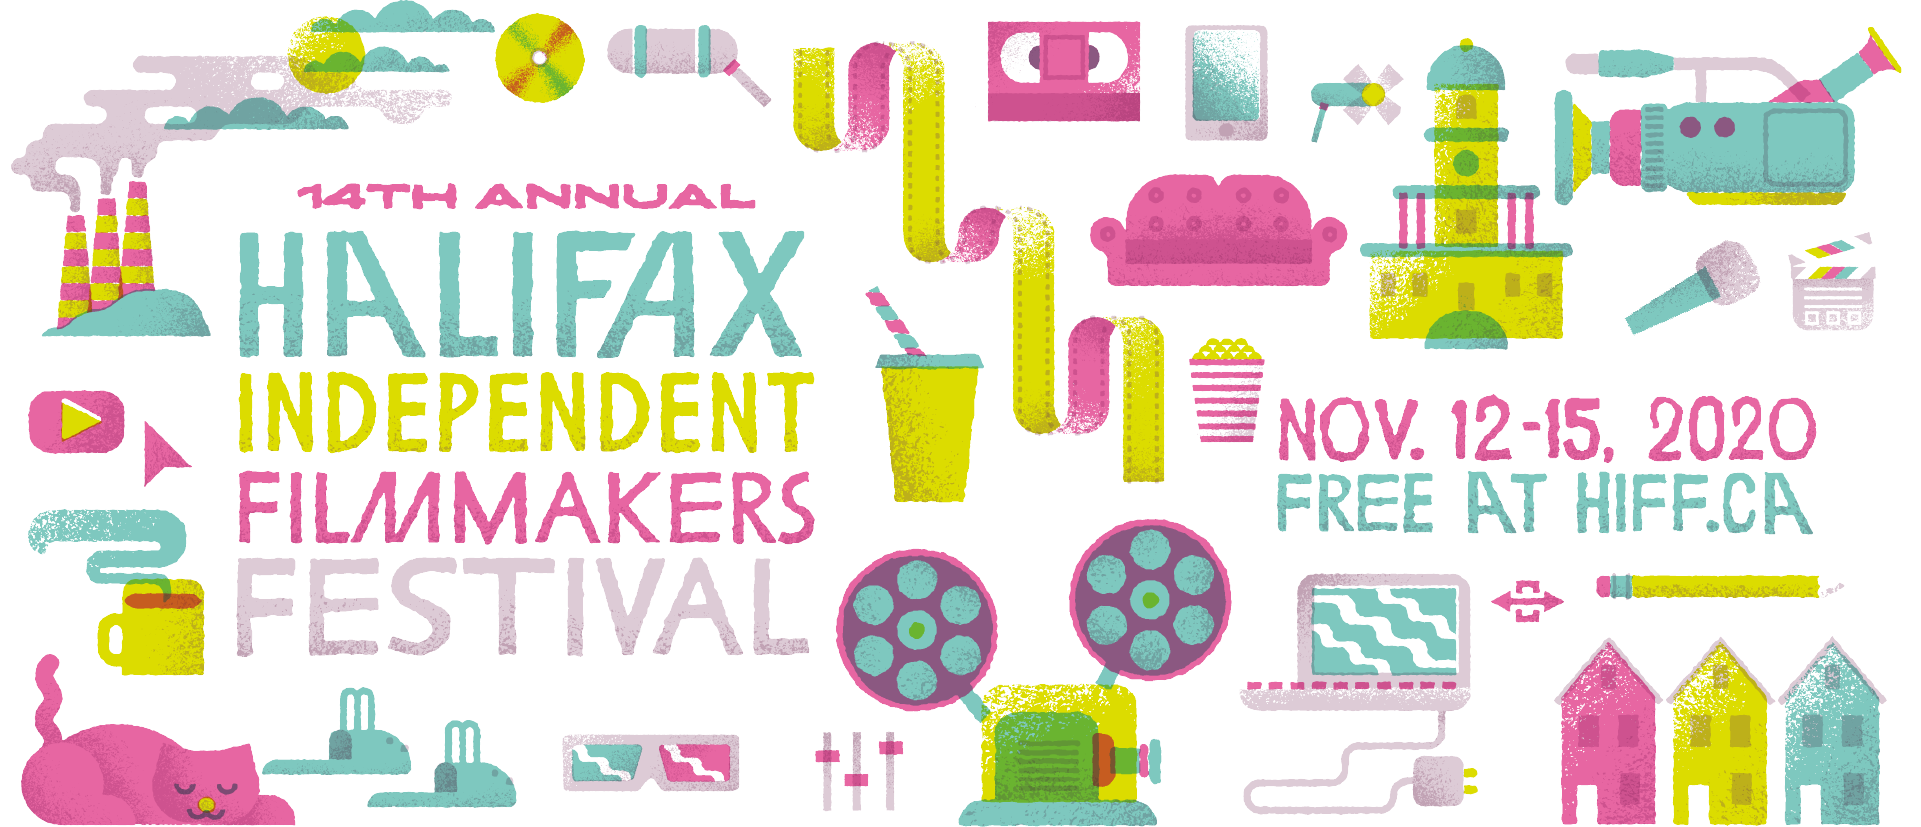 Halifax Independent Filmmakers Festival 2020